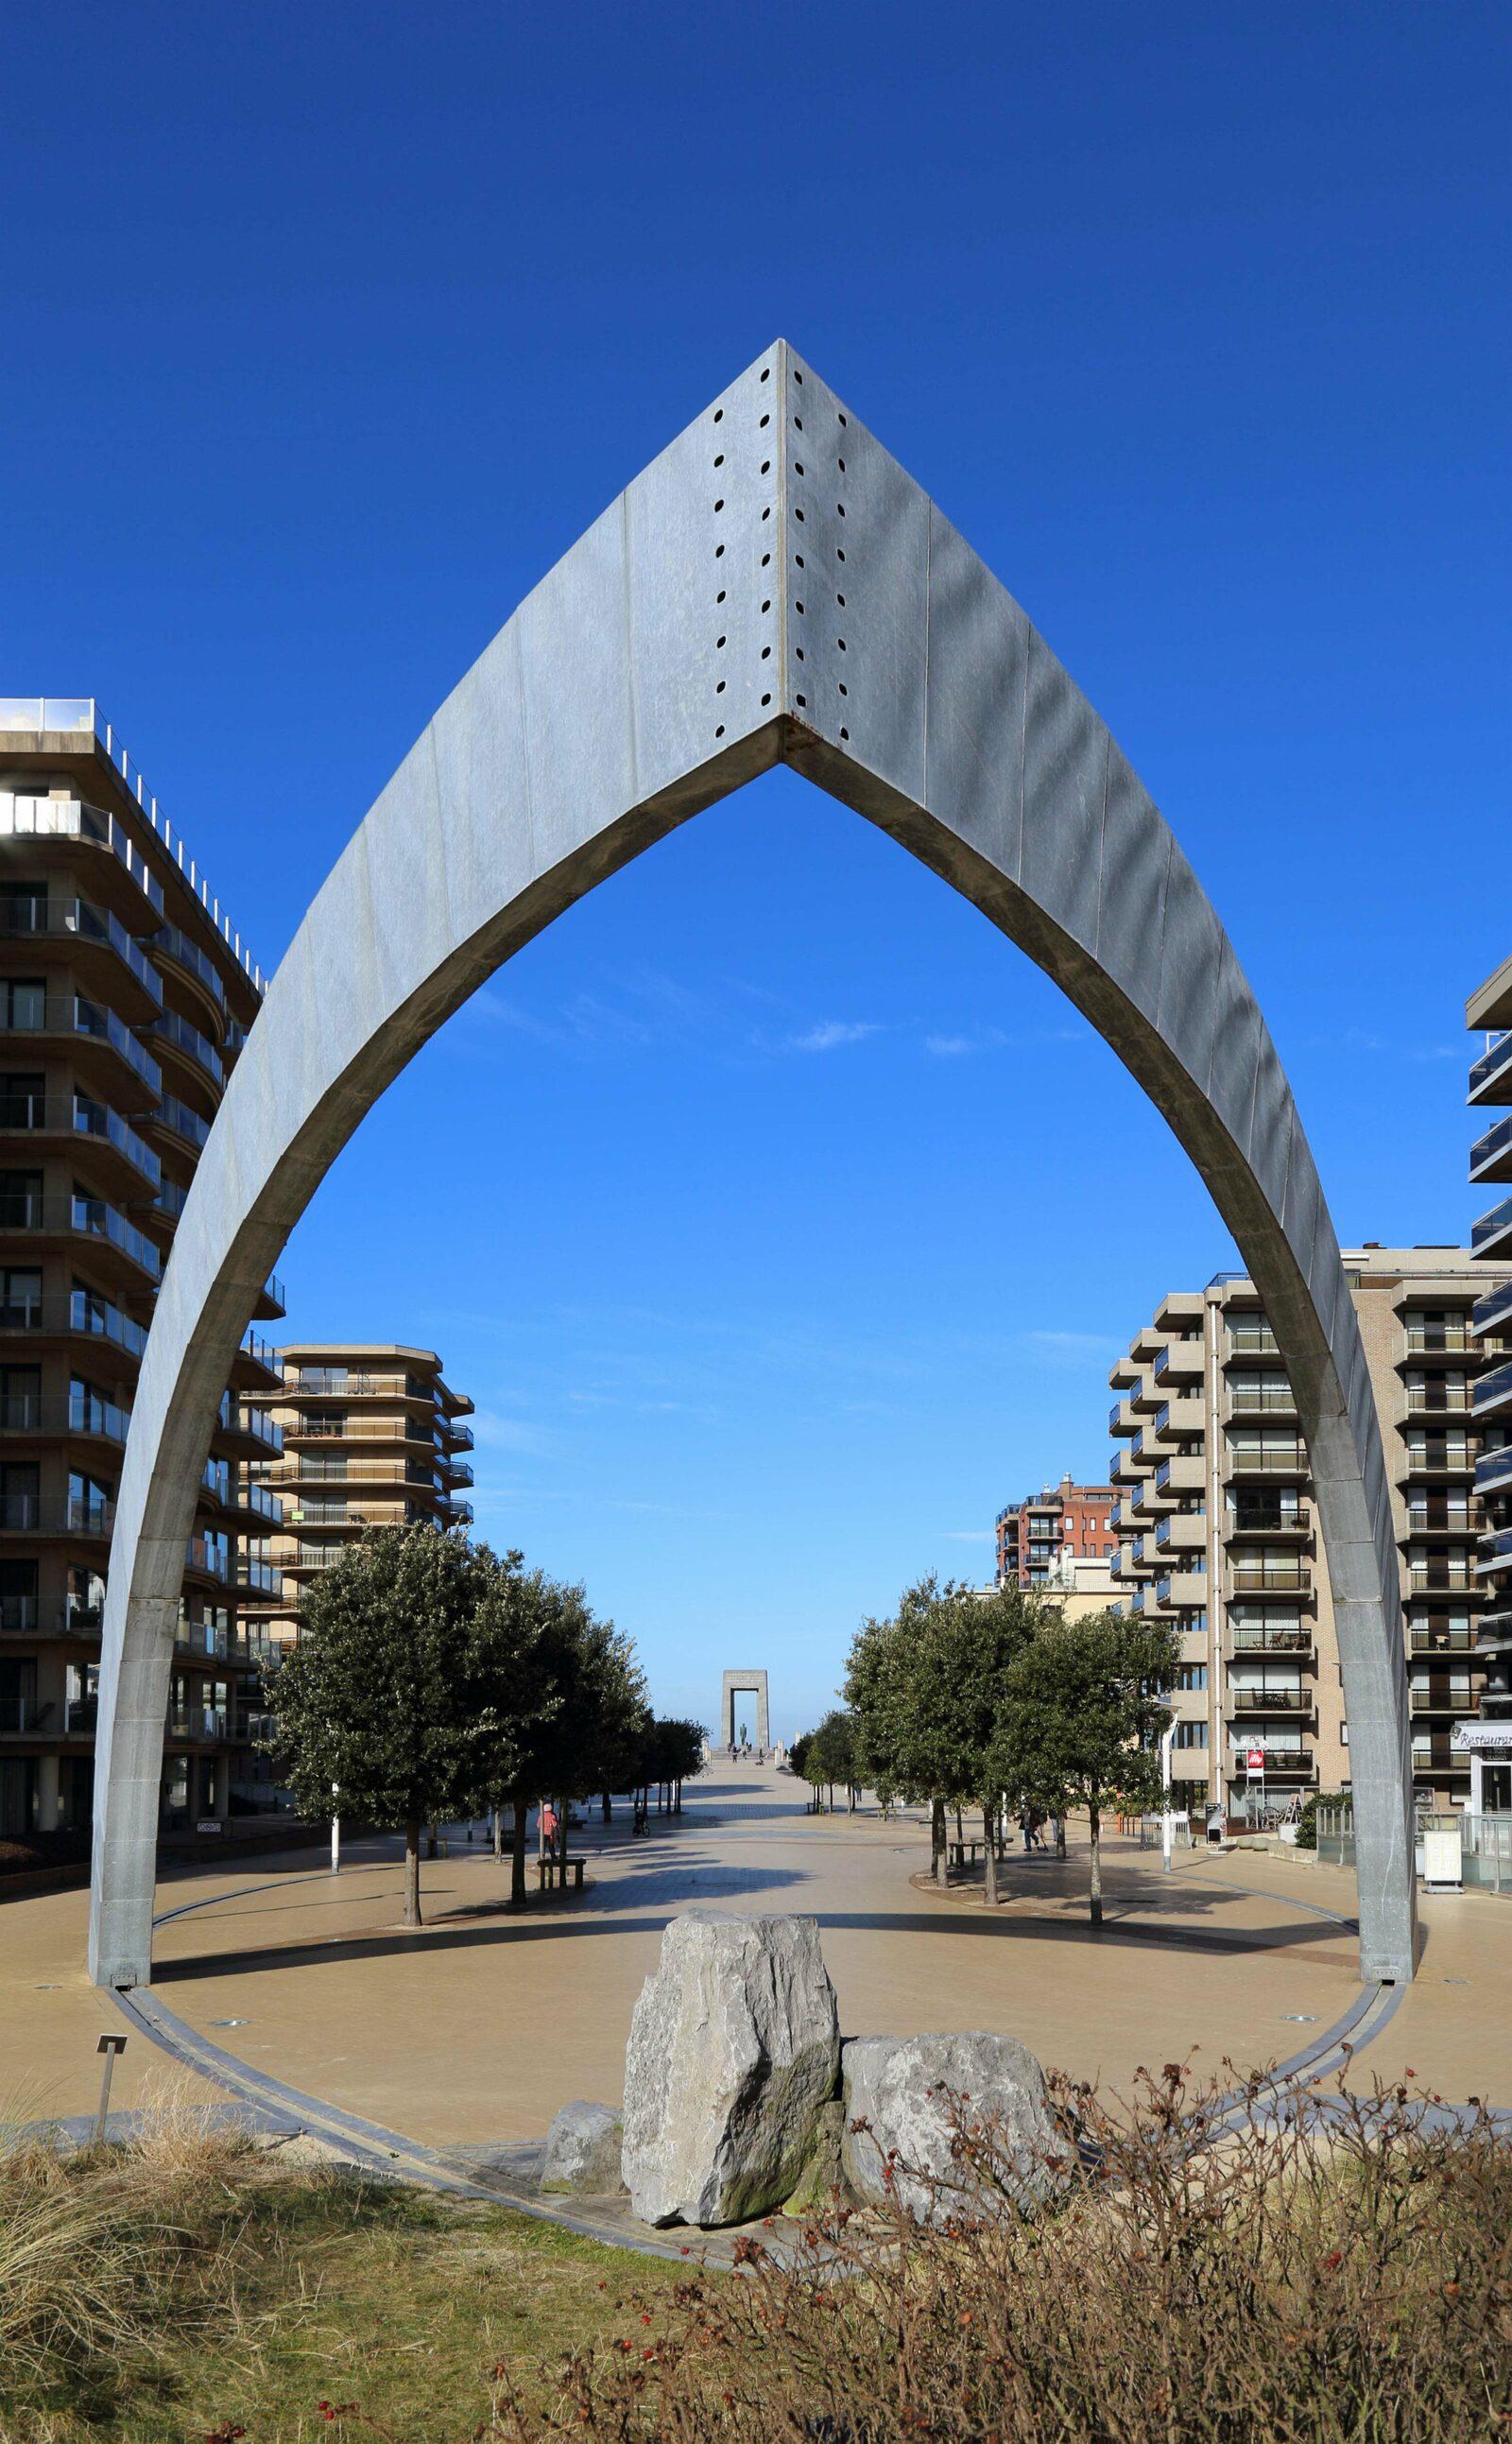 The esplanade of De Panne